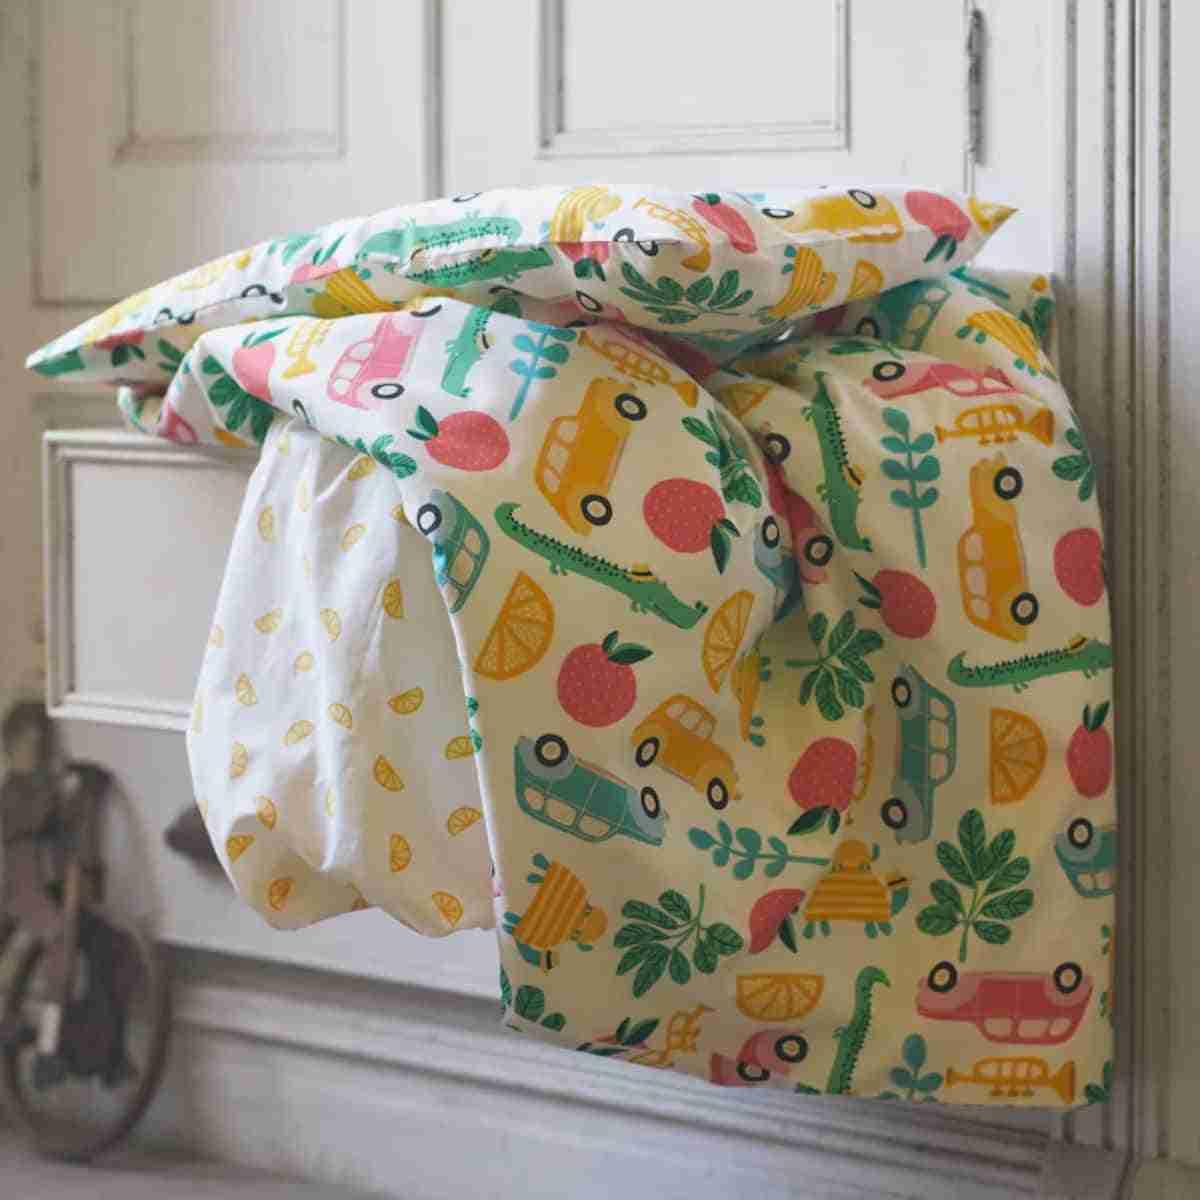 decorar dormitorio de bebe con textiles ikea